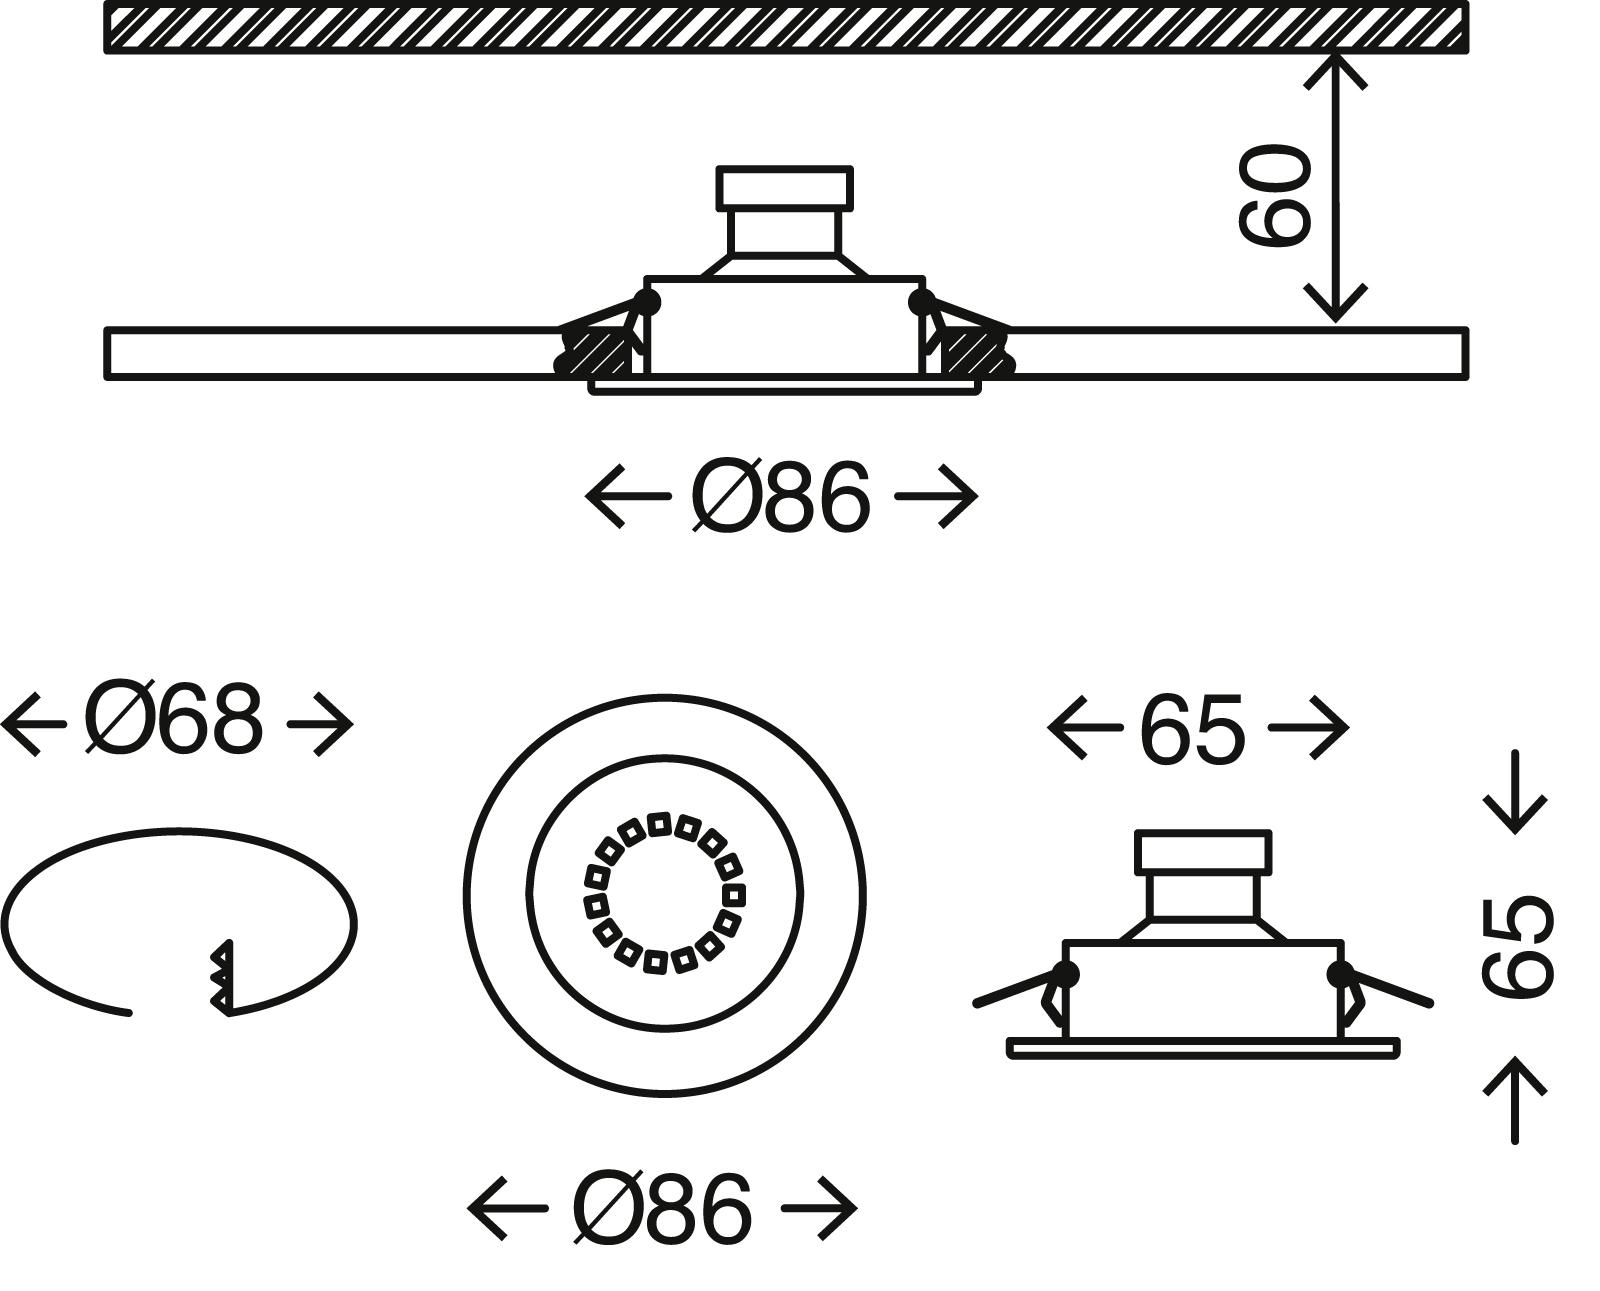 3er-Set Spot Einbauleuchte, Ø 8,6 cm, 3 W, Chrom